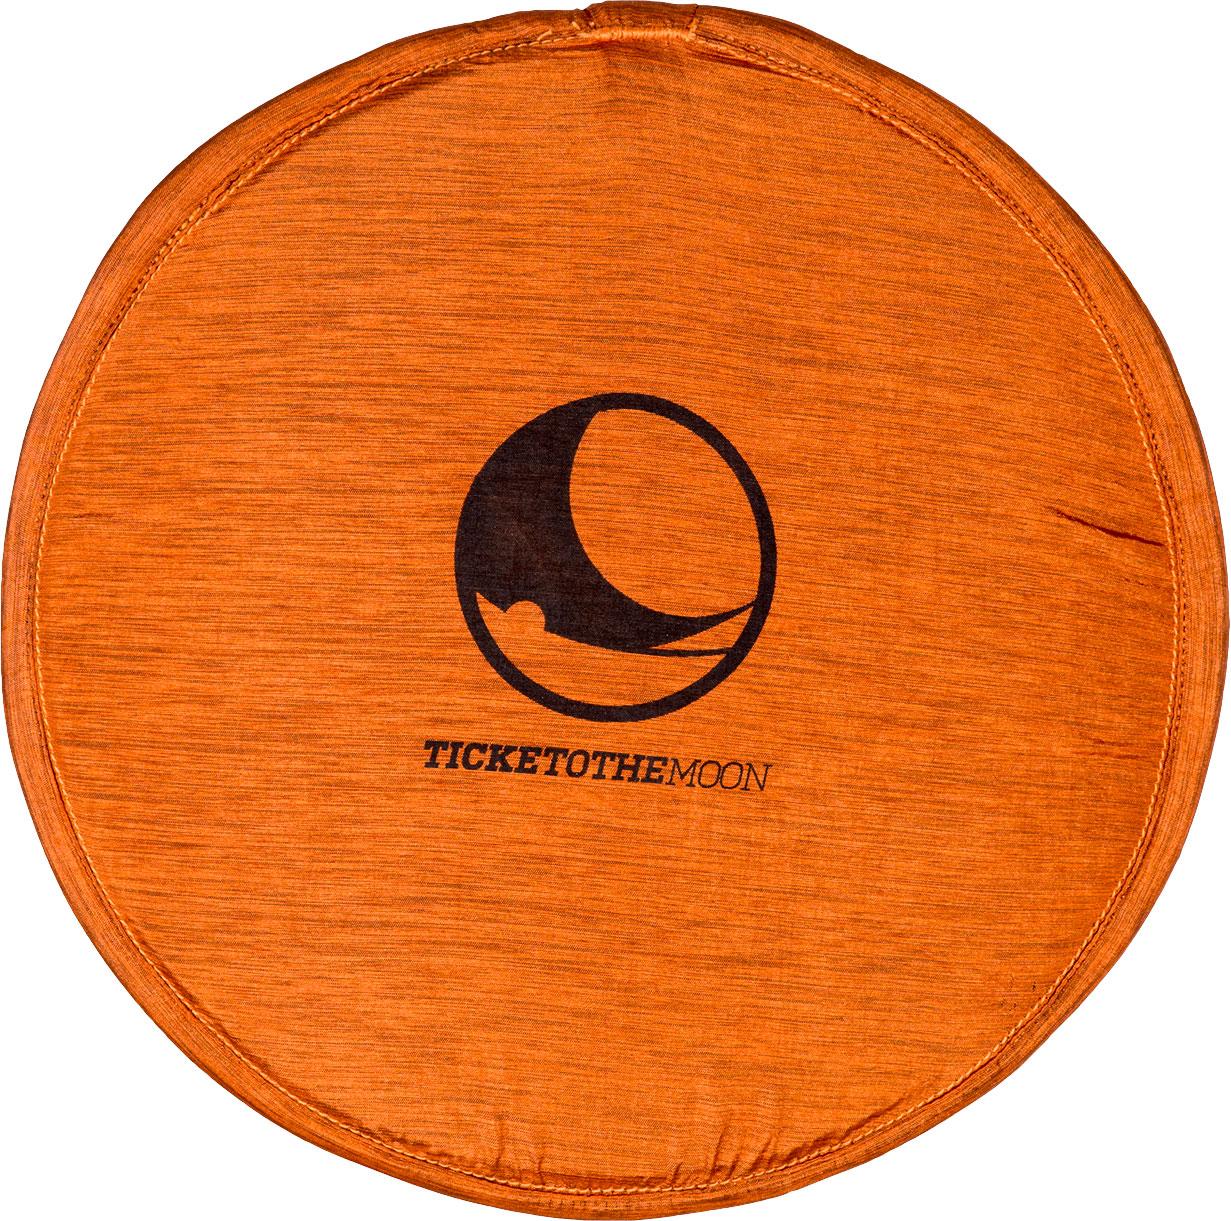 Ticket to the Moon Pocket Frisbee Terracotta Orange